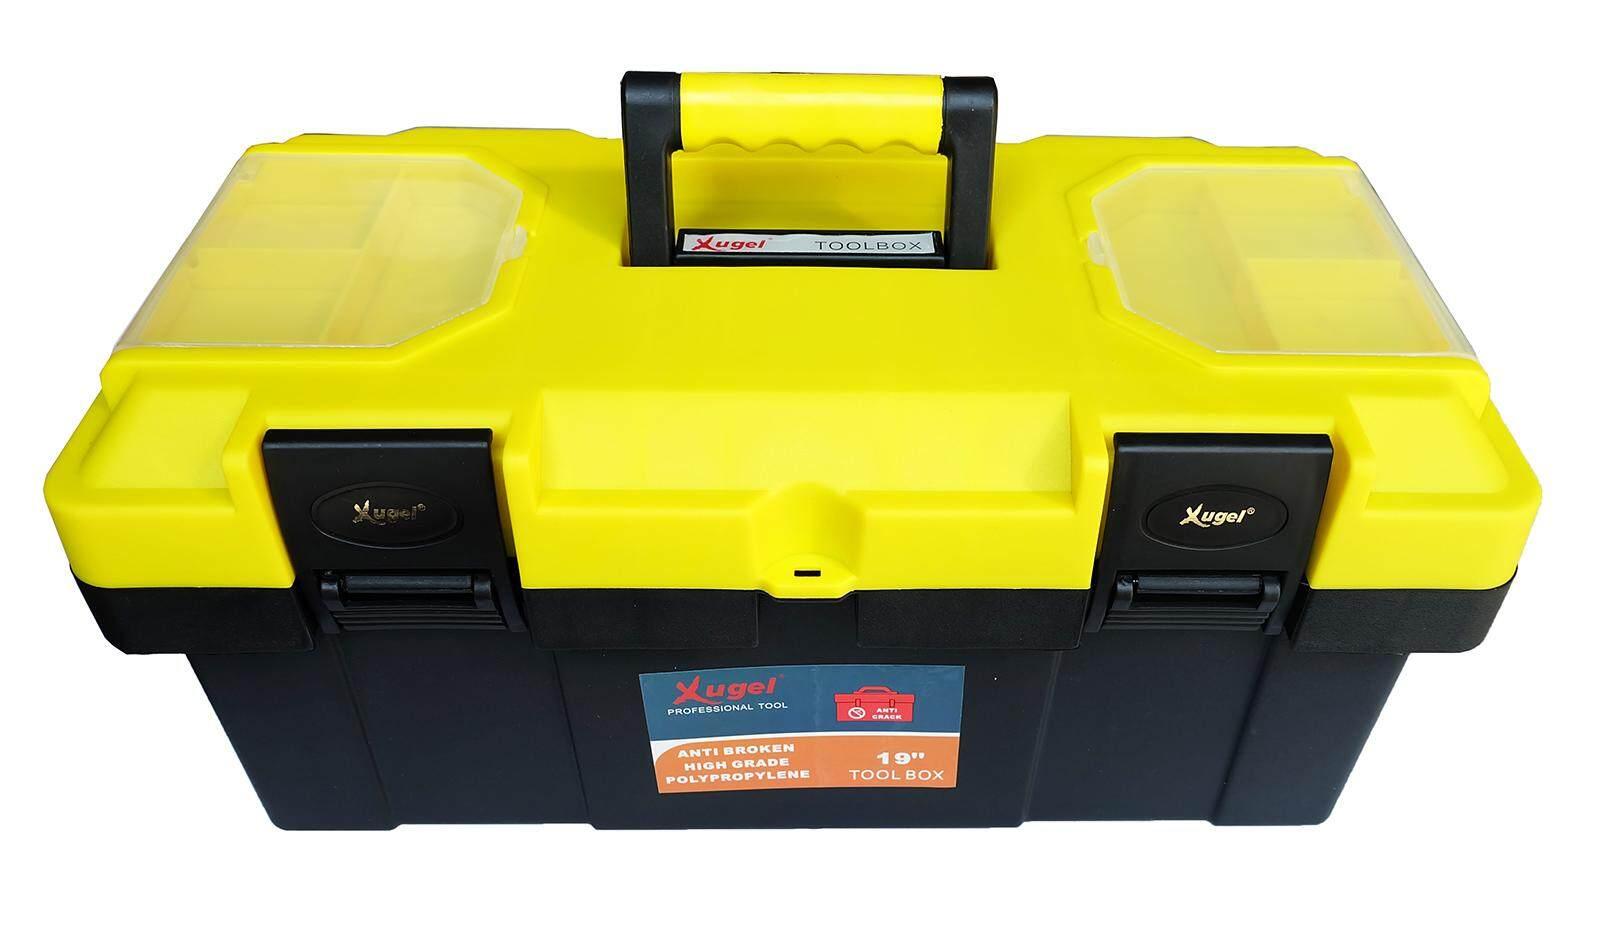 Xugel กล่องใส่เครื่องมือ หรือ ลังใส่เครื่องมือ Xugel Anti-Crack Polypropylene (pp) Tool Box 19.